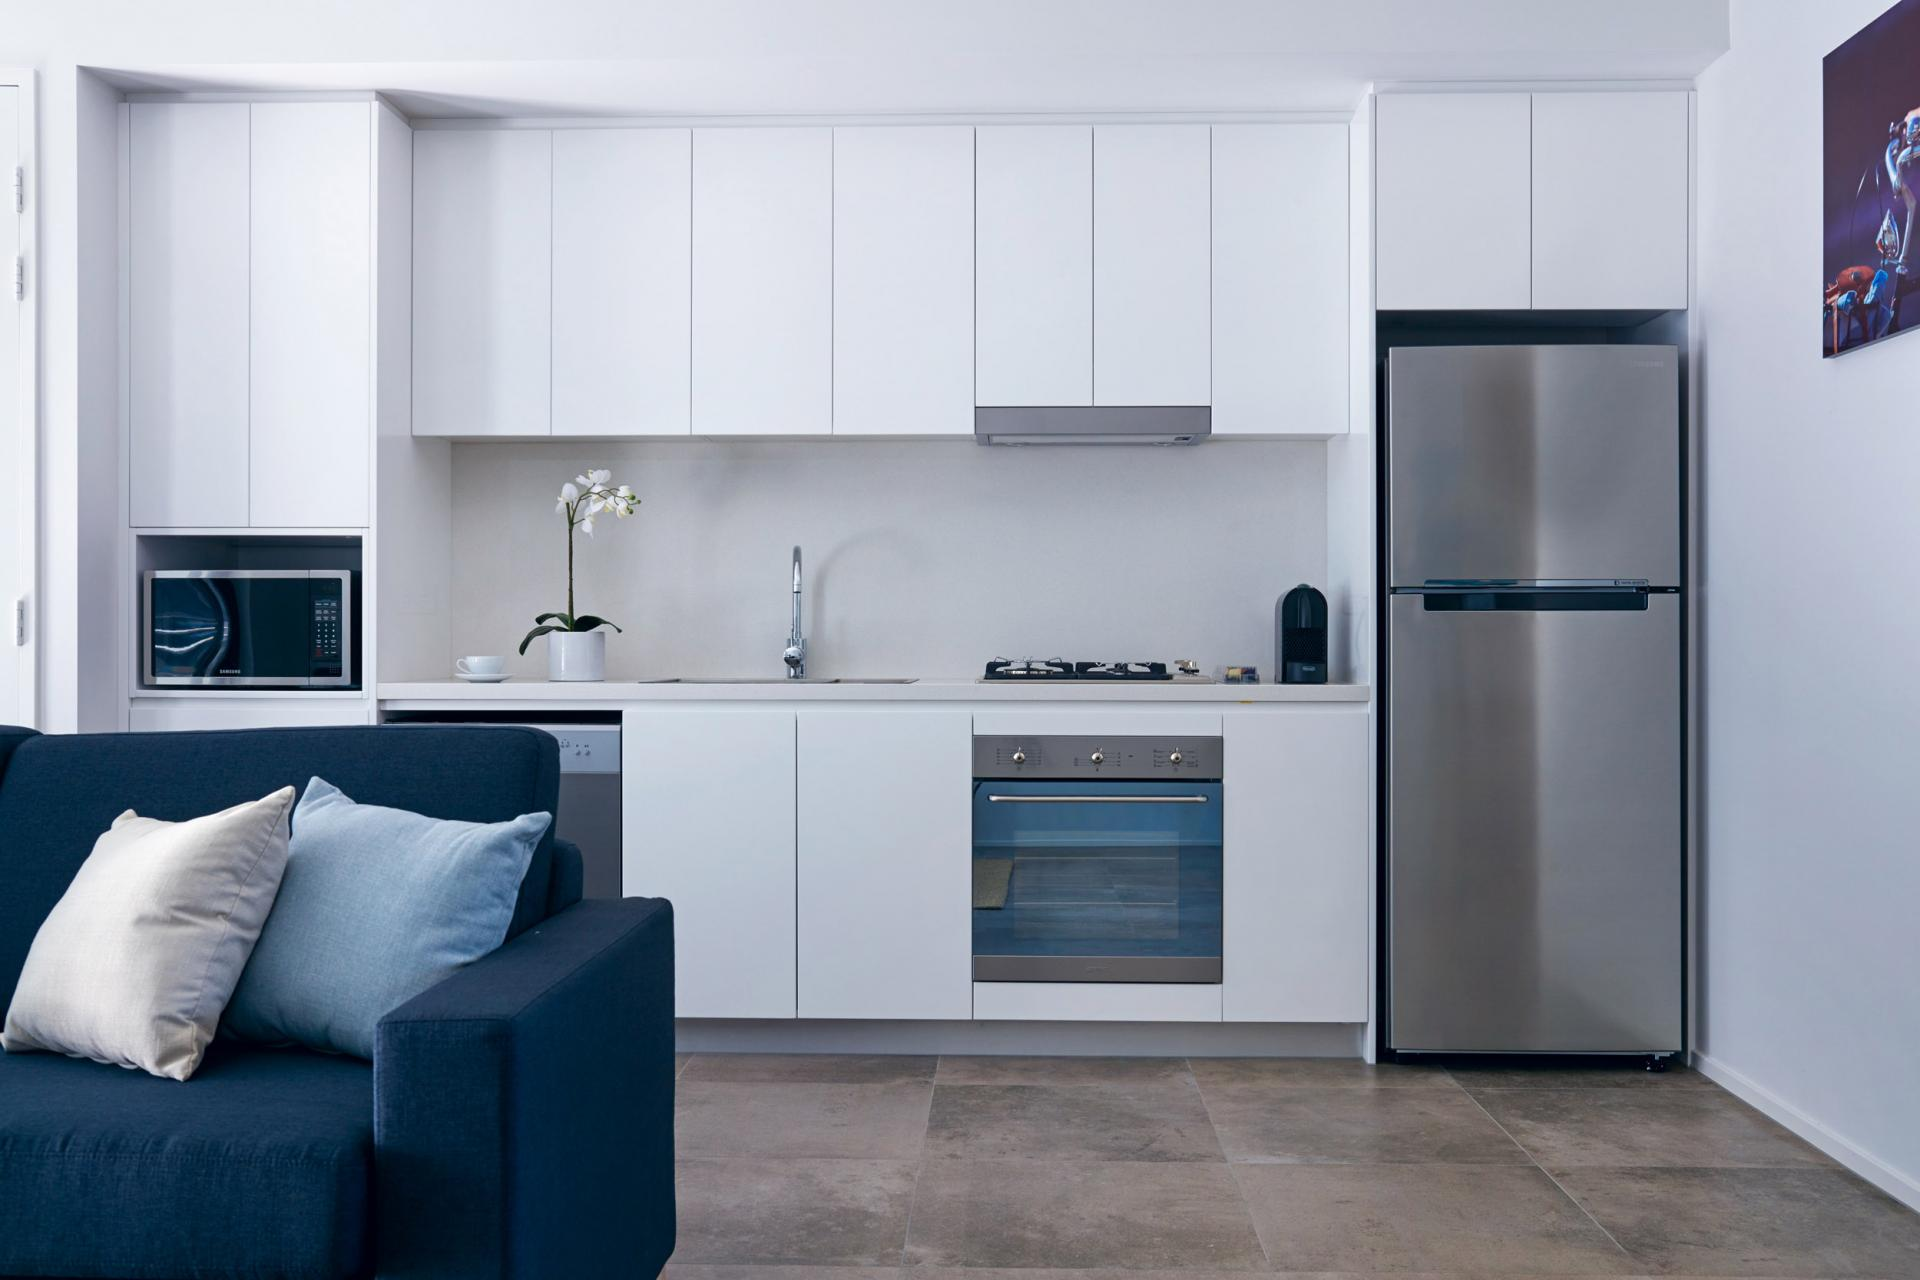 Kitchen at Veriu Camperdown Apartments